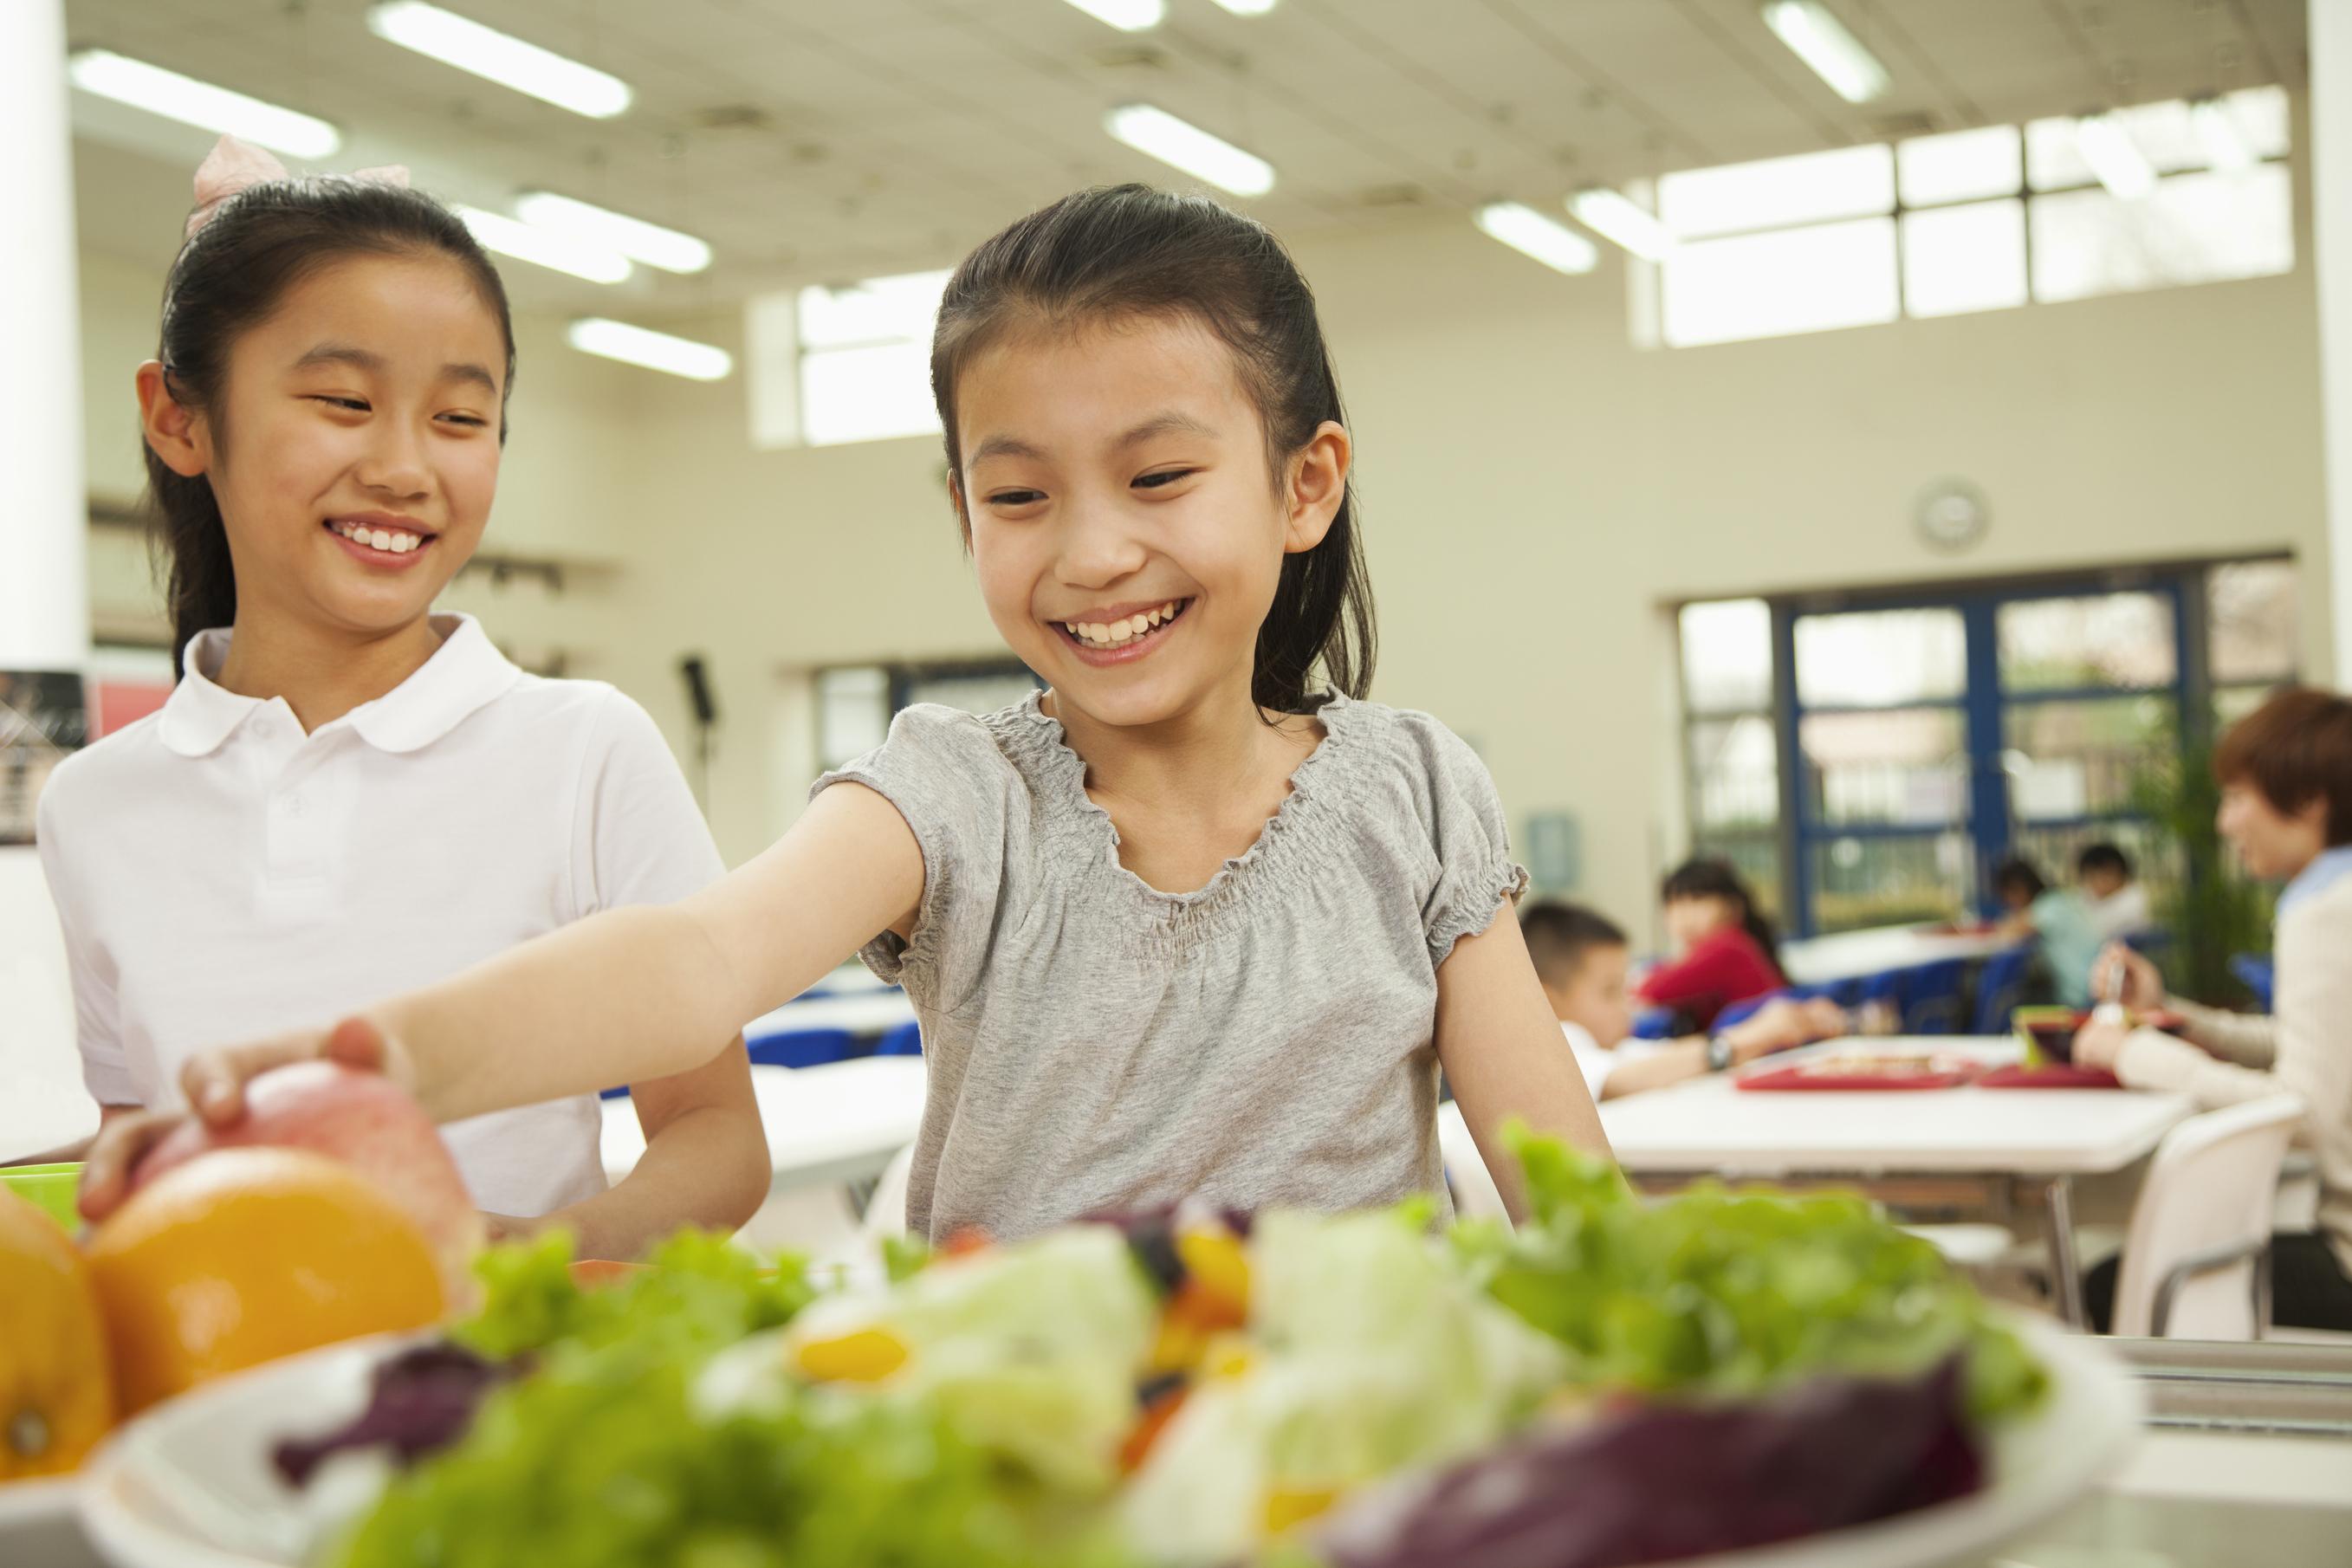 Rhode Island: Strong Standards for School Snacks!